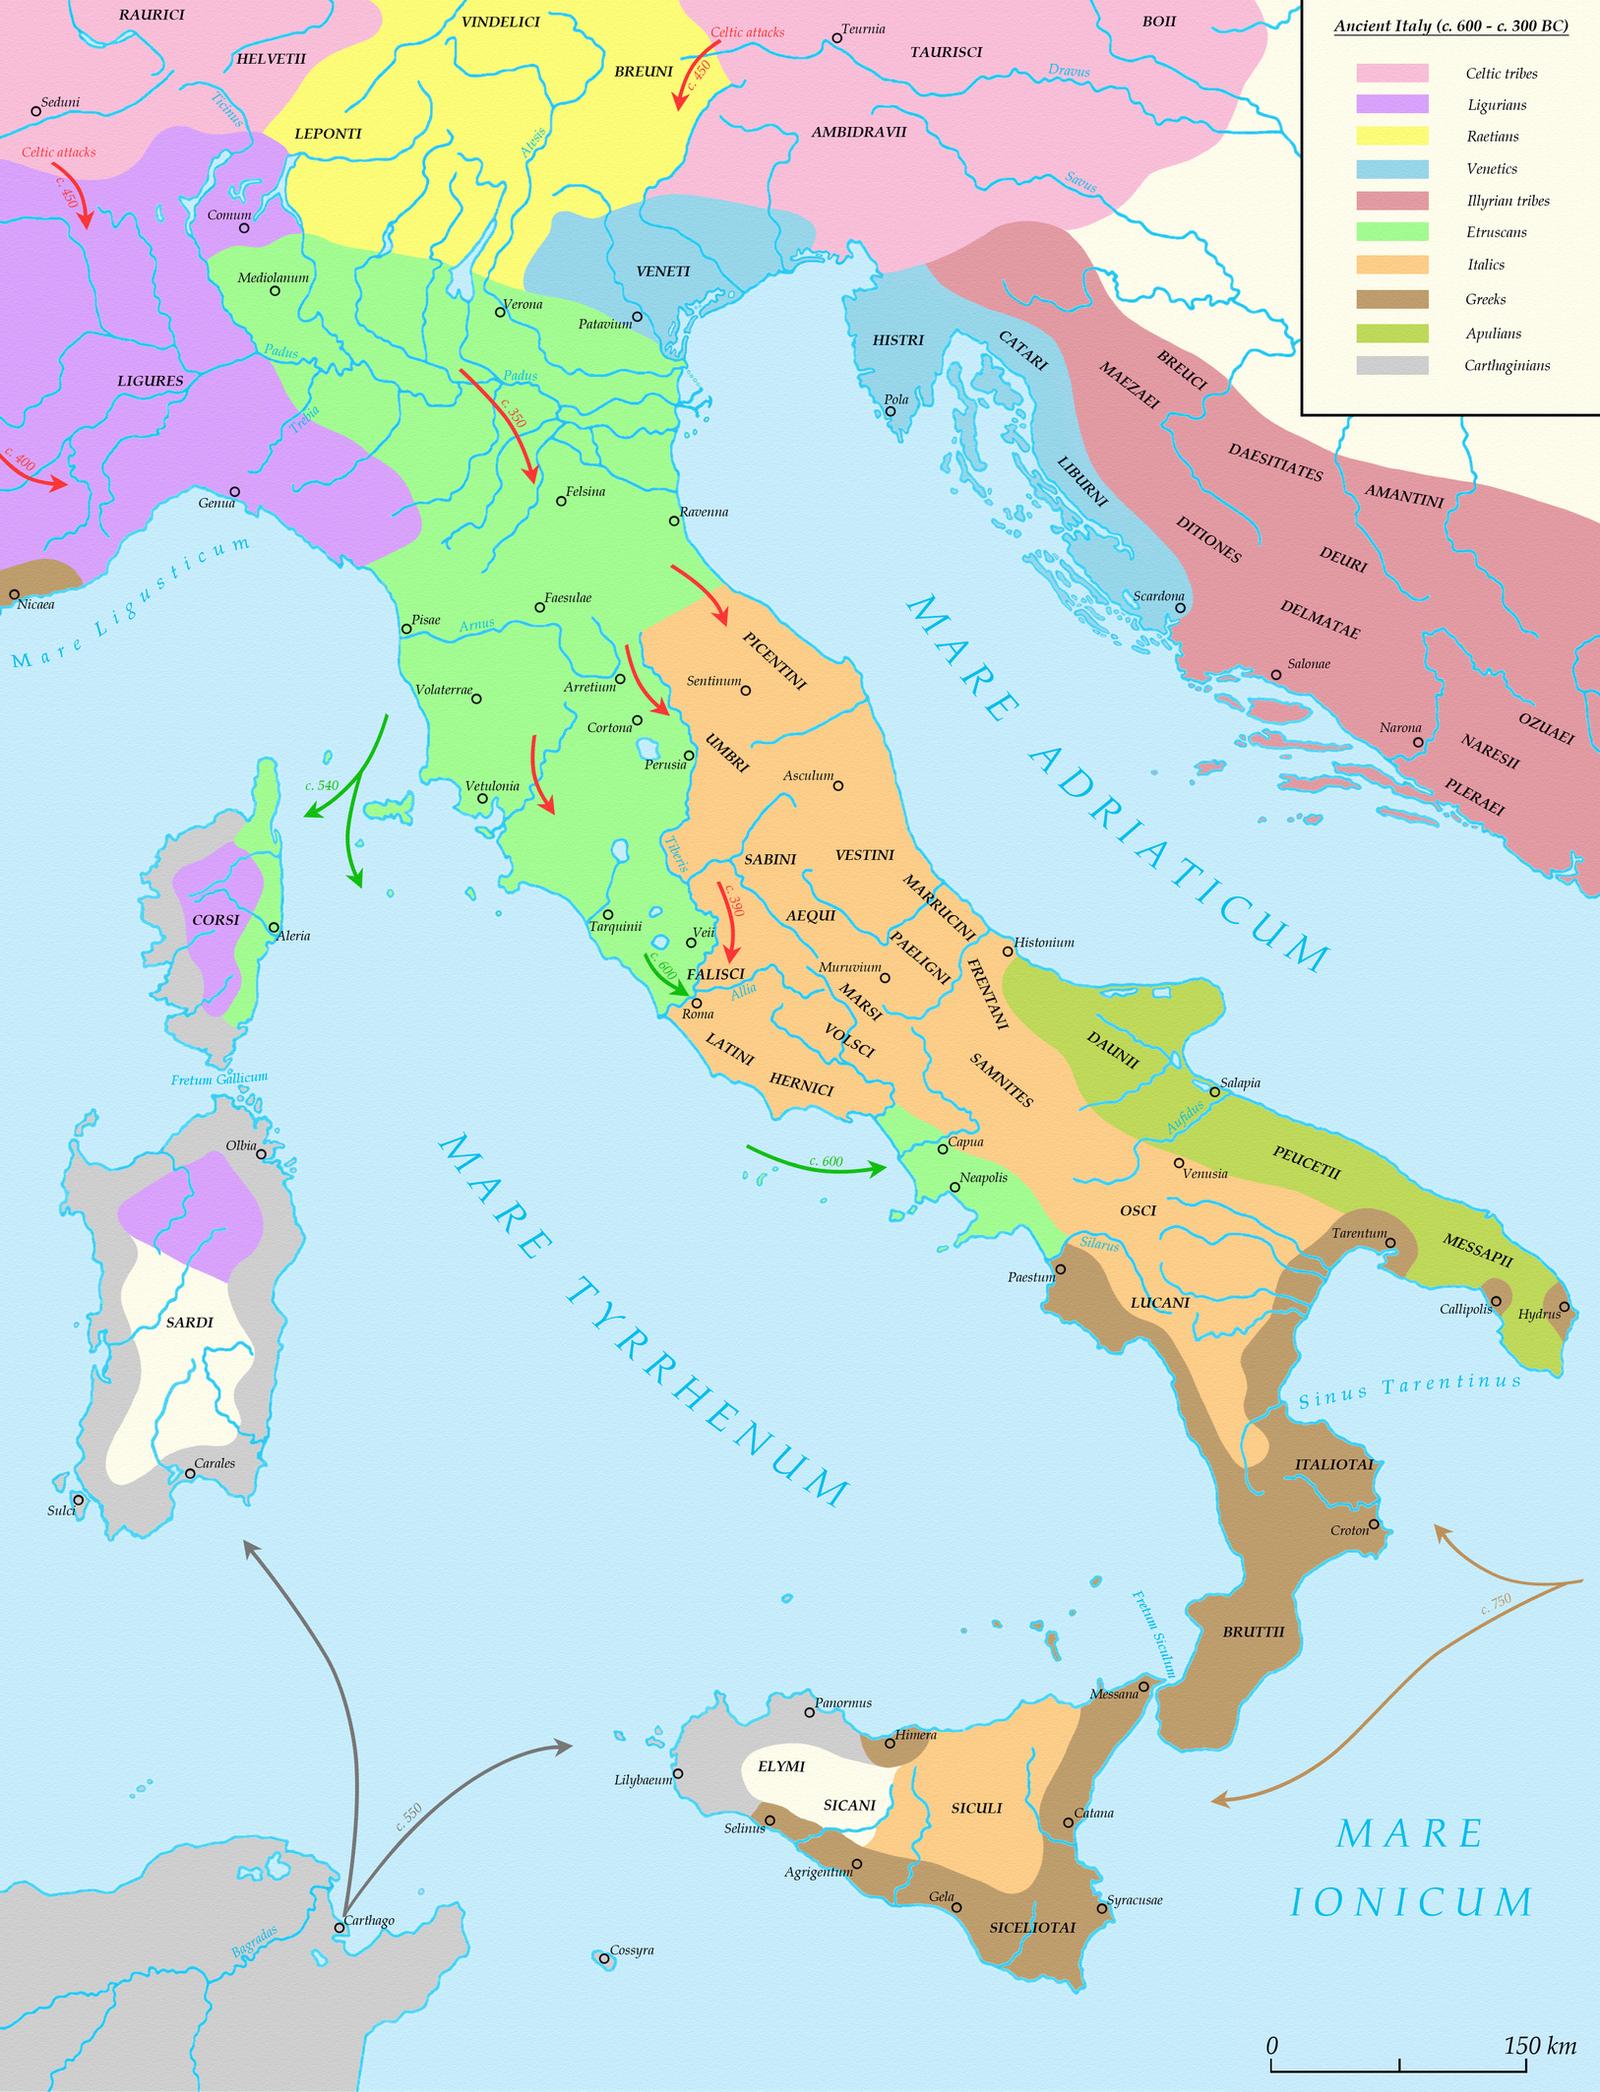 ancient greek and roman republic political Both ancient roman and greek civilizations took  ancient greek democracy and the ancient roman republic may seem the same  a democracy is a political system.